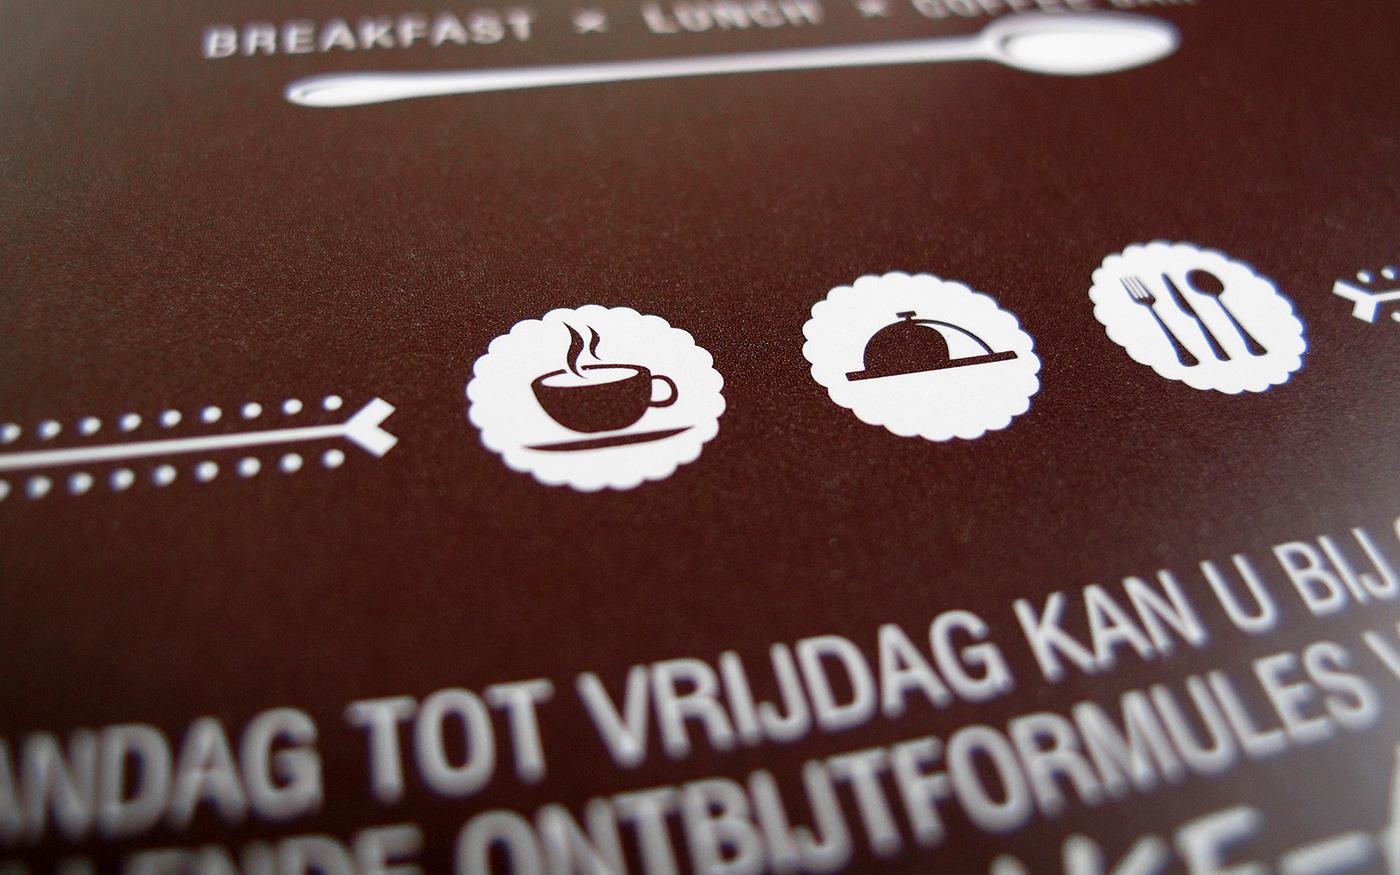 breakfast lunch brasserie corpoate ID business card Rubber Stamp loyalty card flyer logo spot color